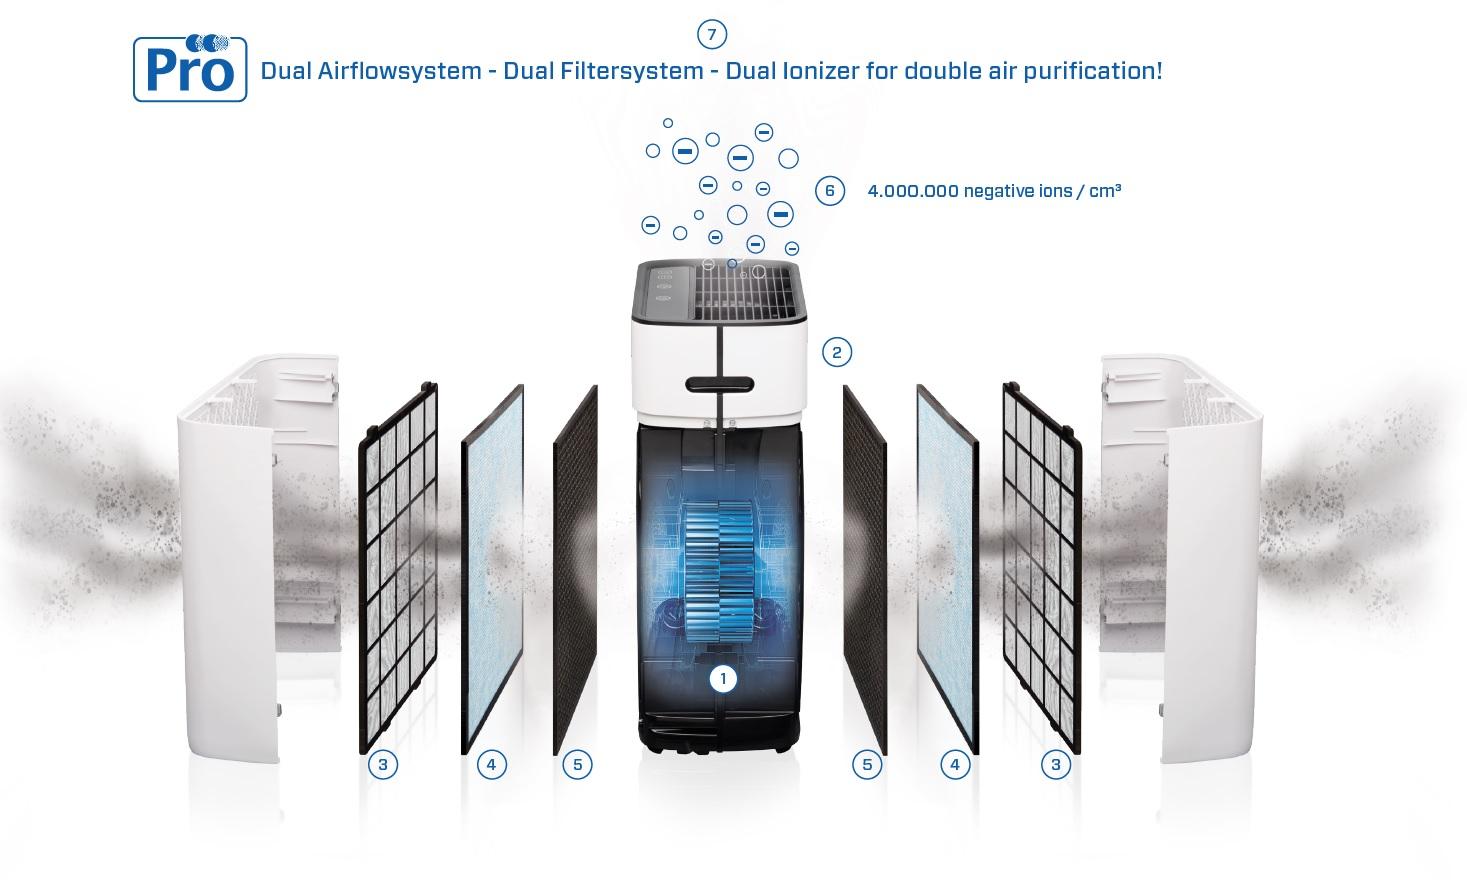 Sistema de purificacion de calidad clean air optima ca-510pro